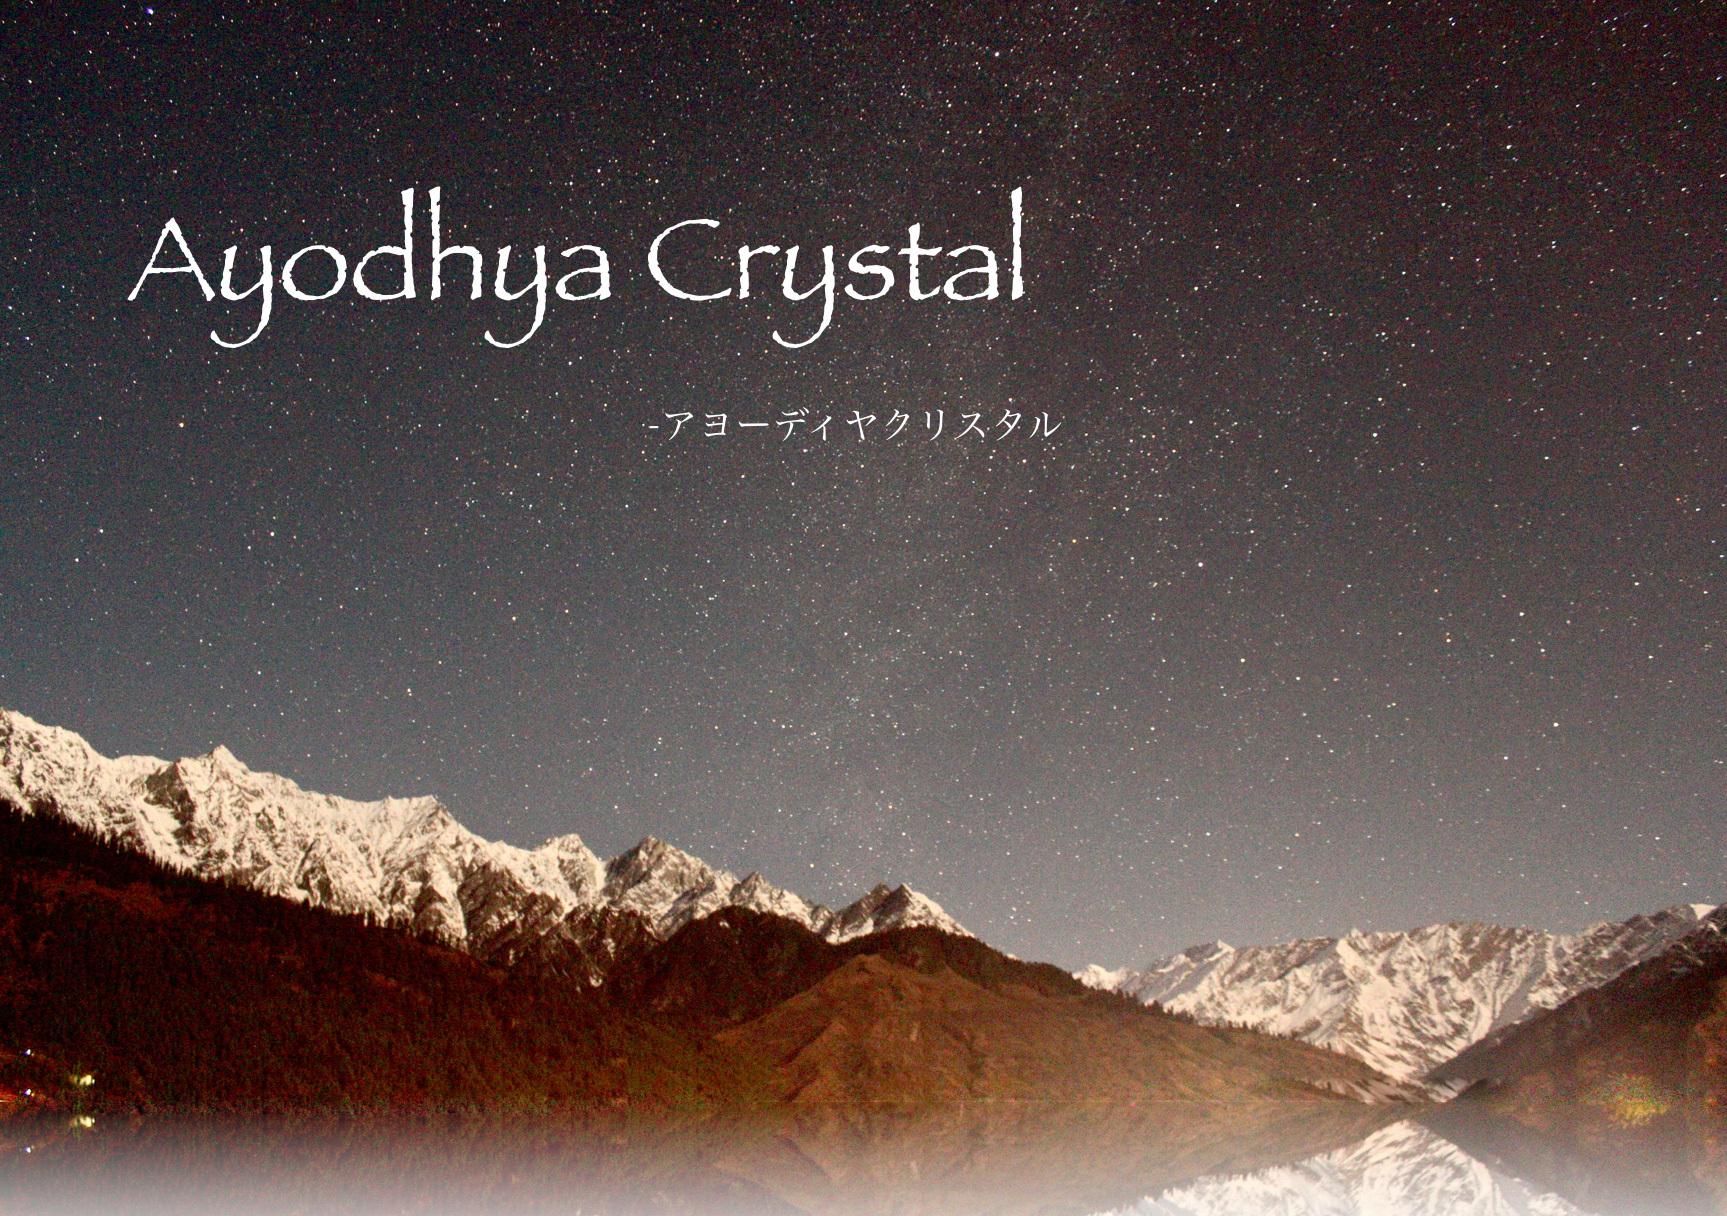 Ayodhya crystal ーアヨーディヤクリスタル